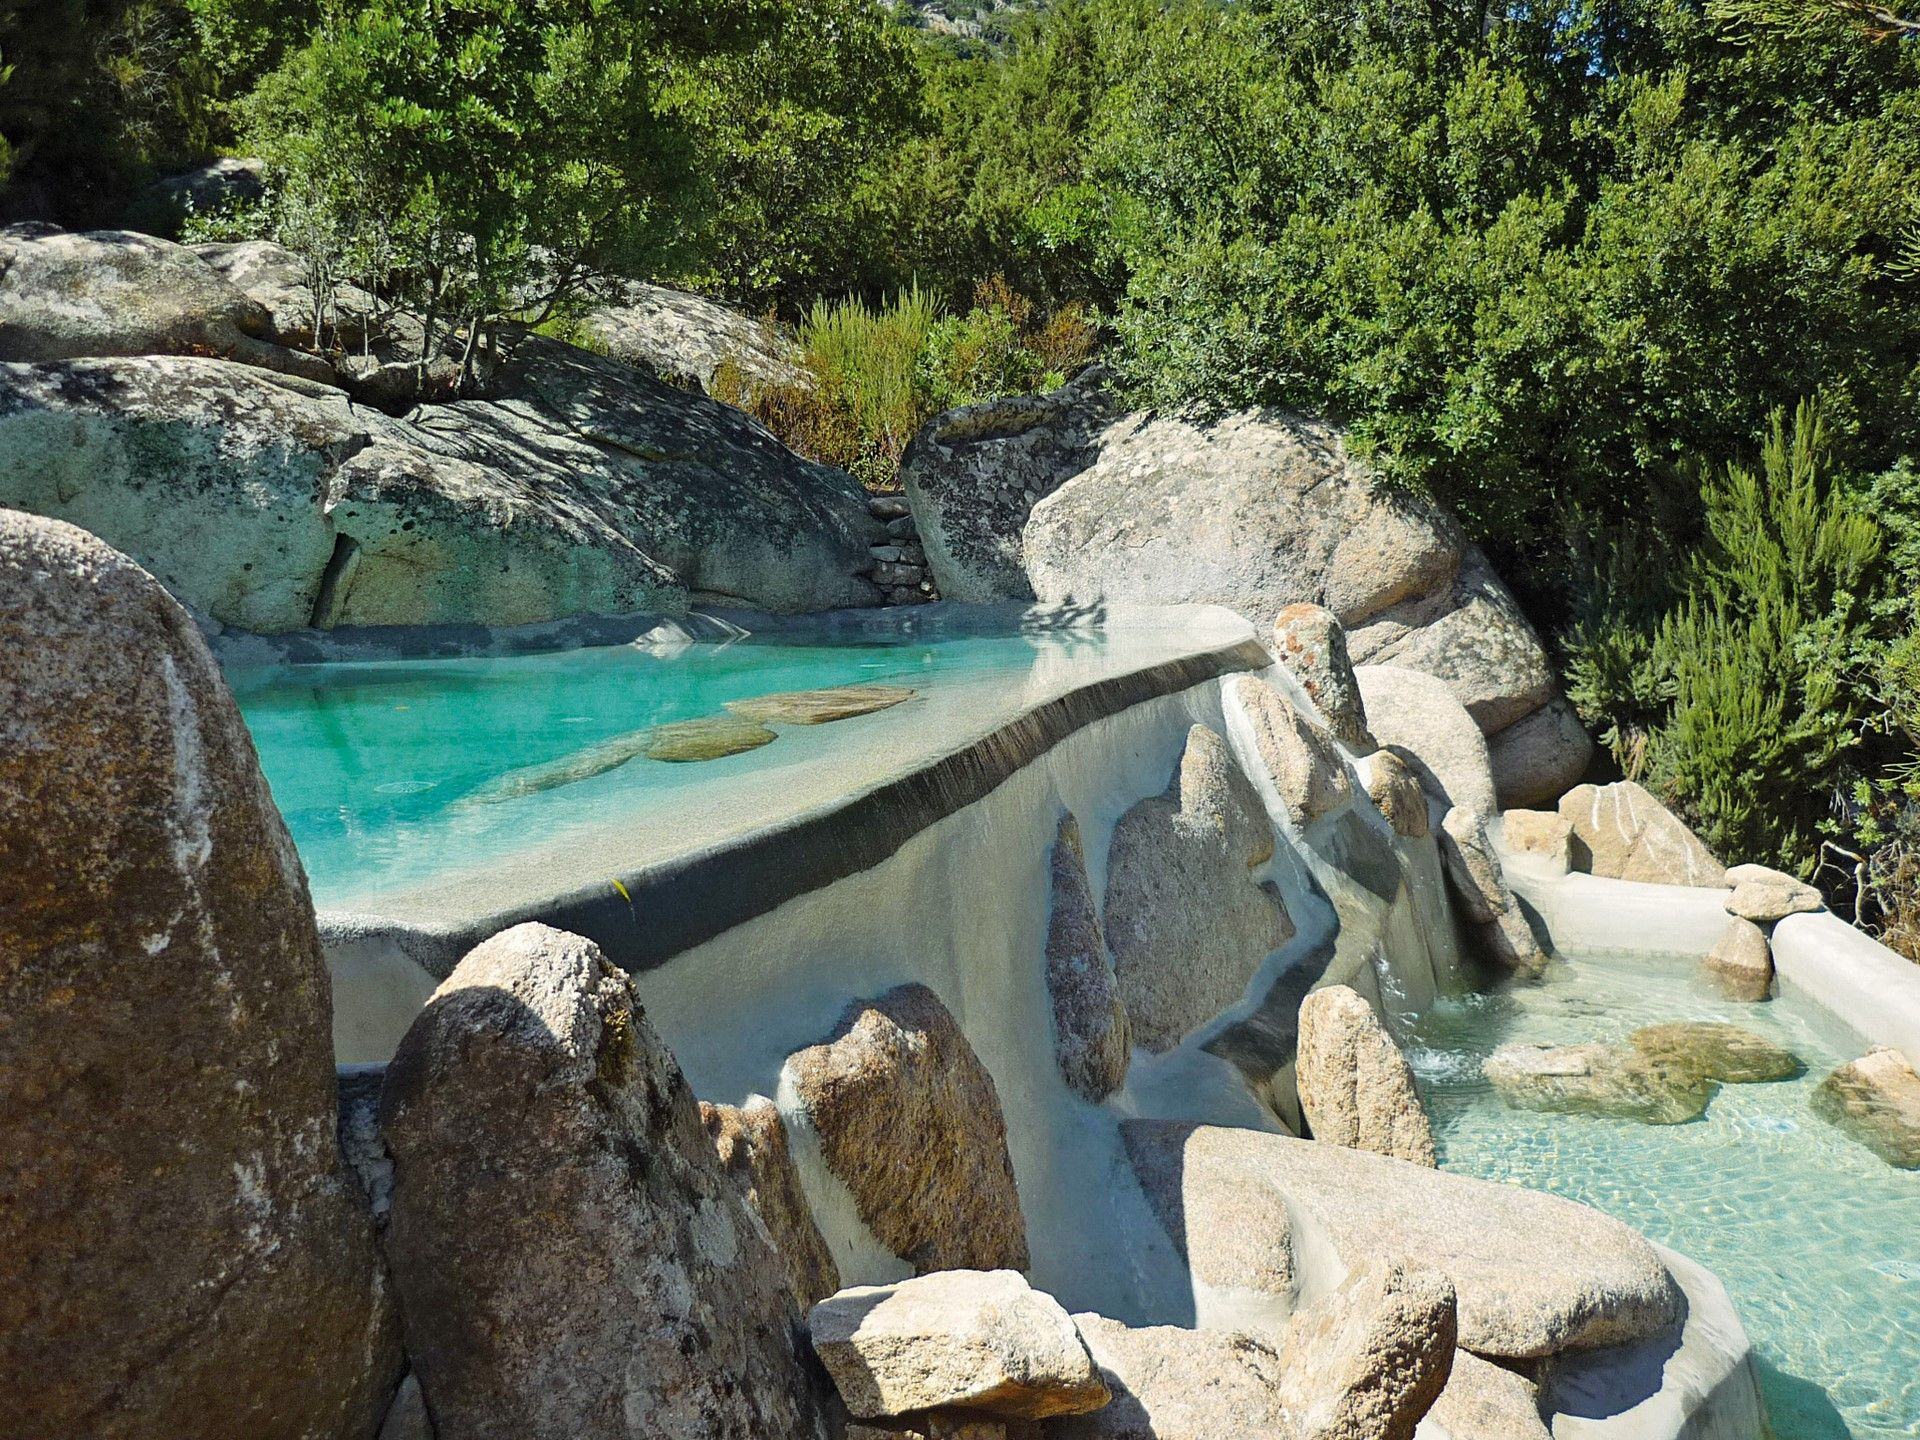 Piscinas de arena naturales en madrid